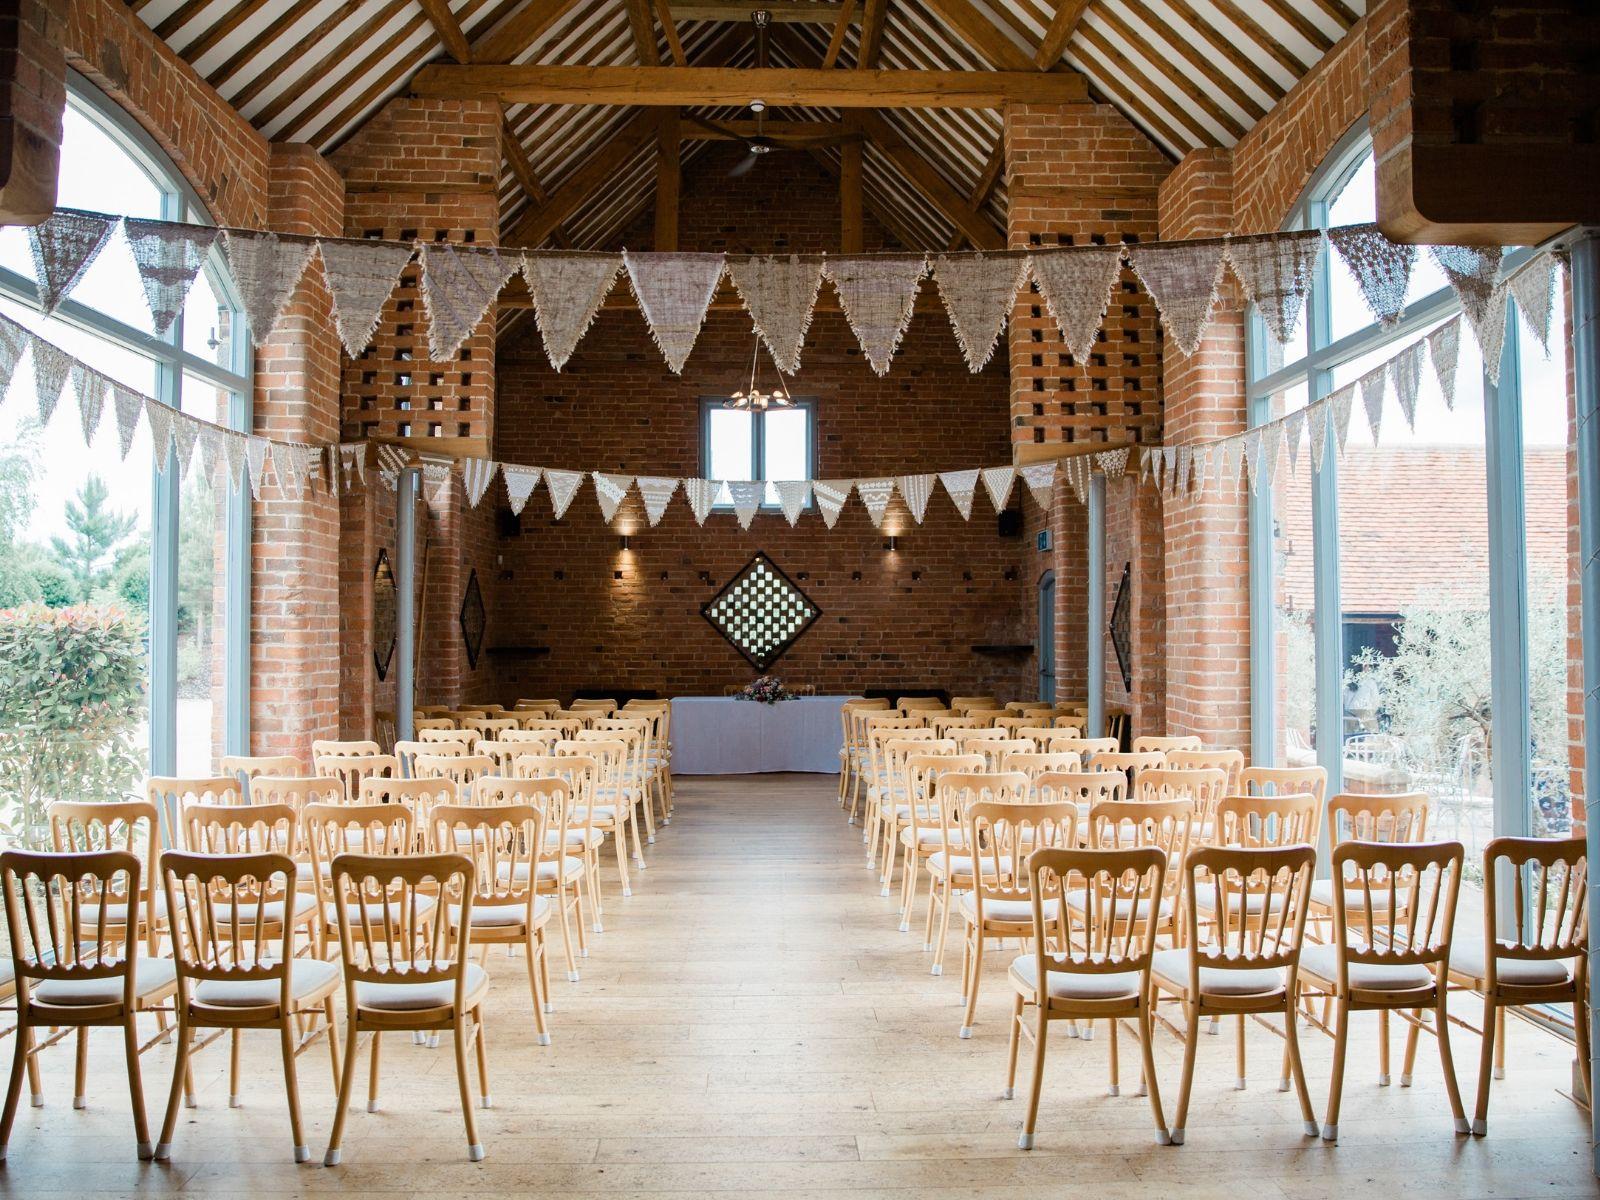 Inside Swallows Nest Barn Wedding Venue